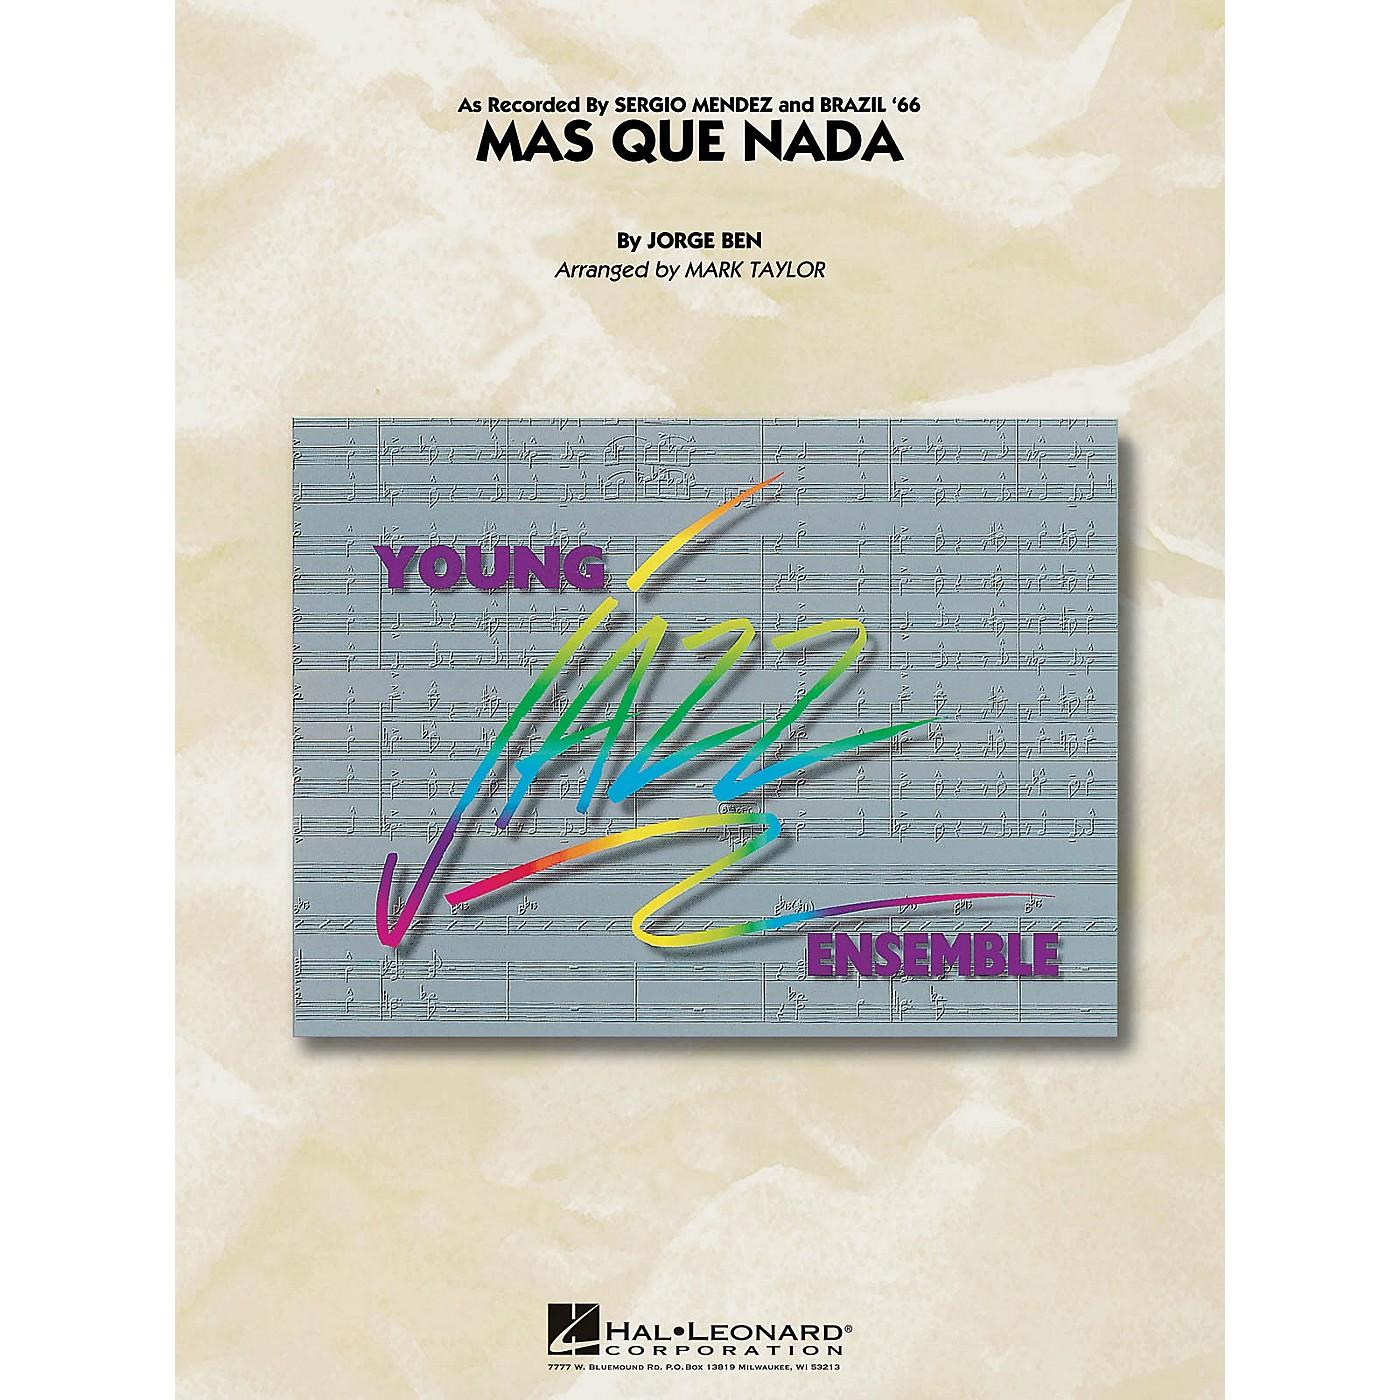 Hal Leonard Mas Que Nada Jazz Band Level 3 by Sergio Mendez Arranged by Mark Taylor thumbnail